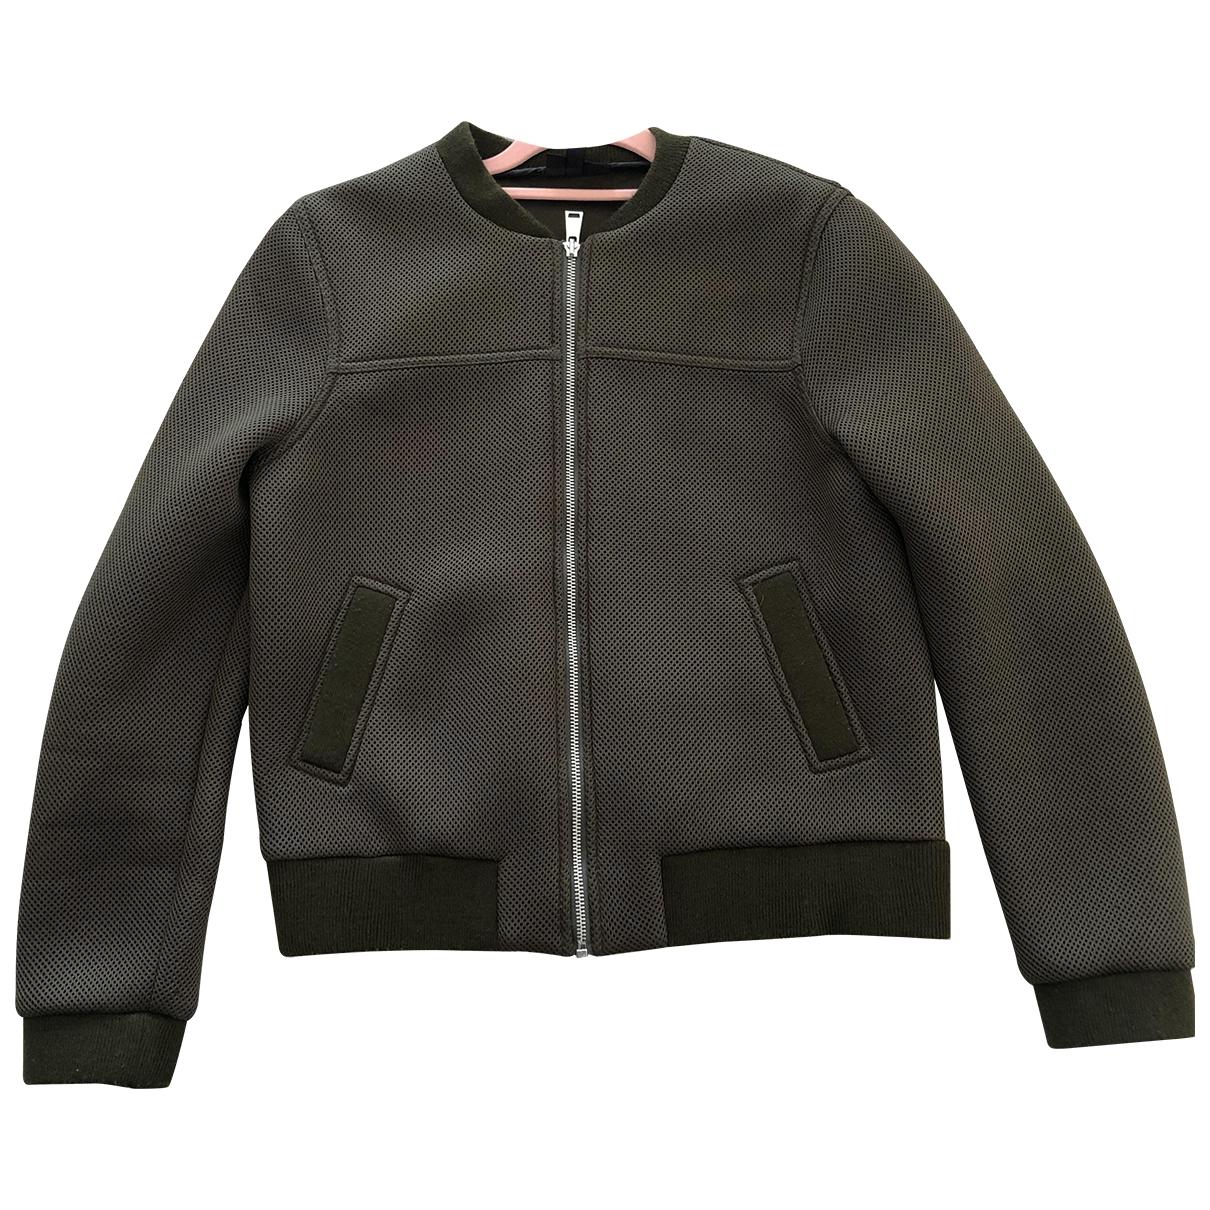 tophop \N Green jacket for Women S International